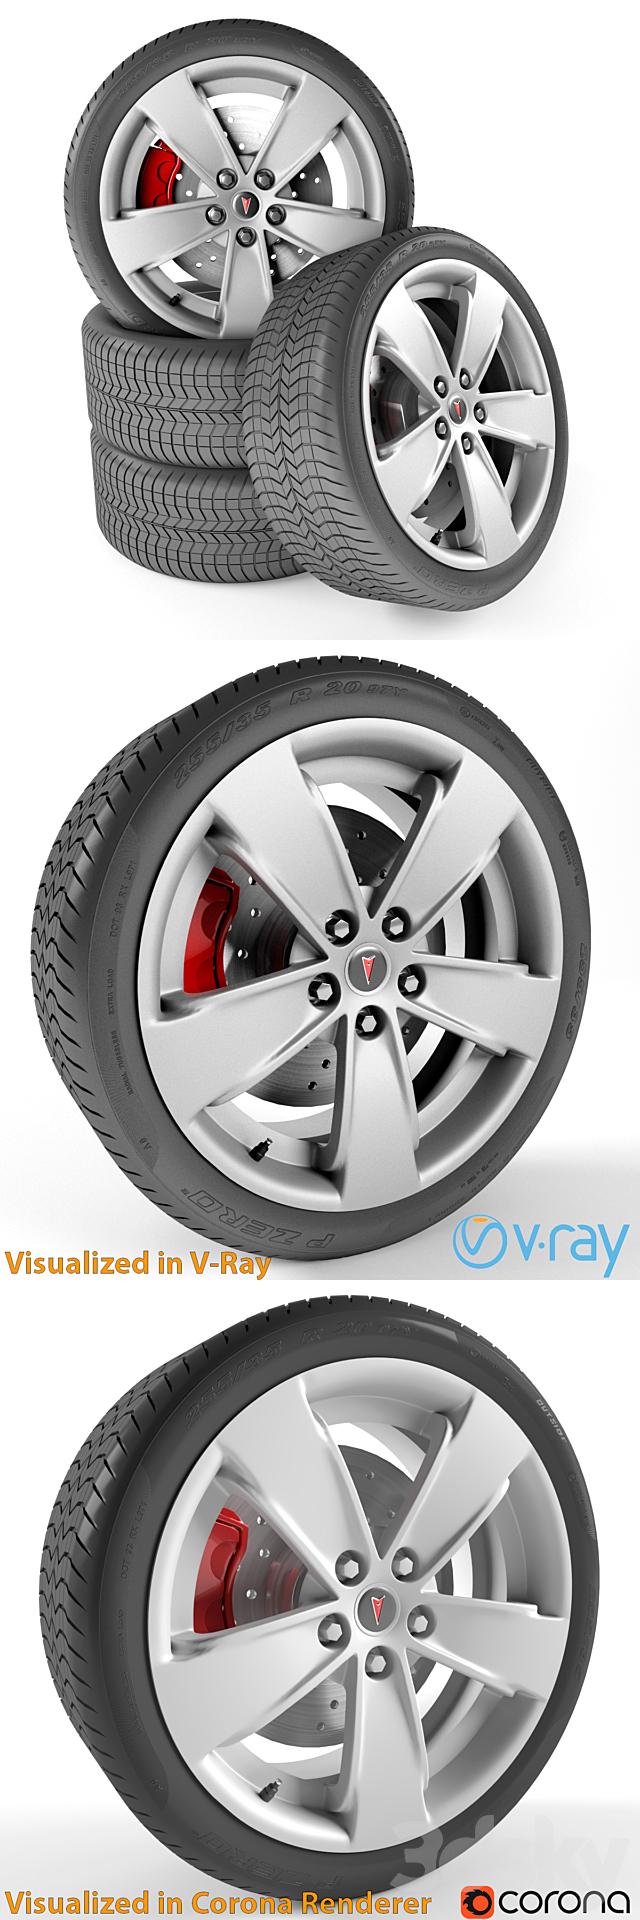 Pontiac Gto Wheel